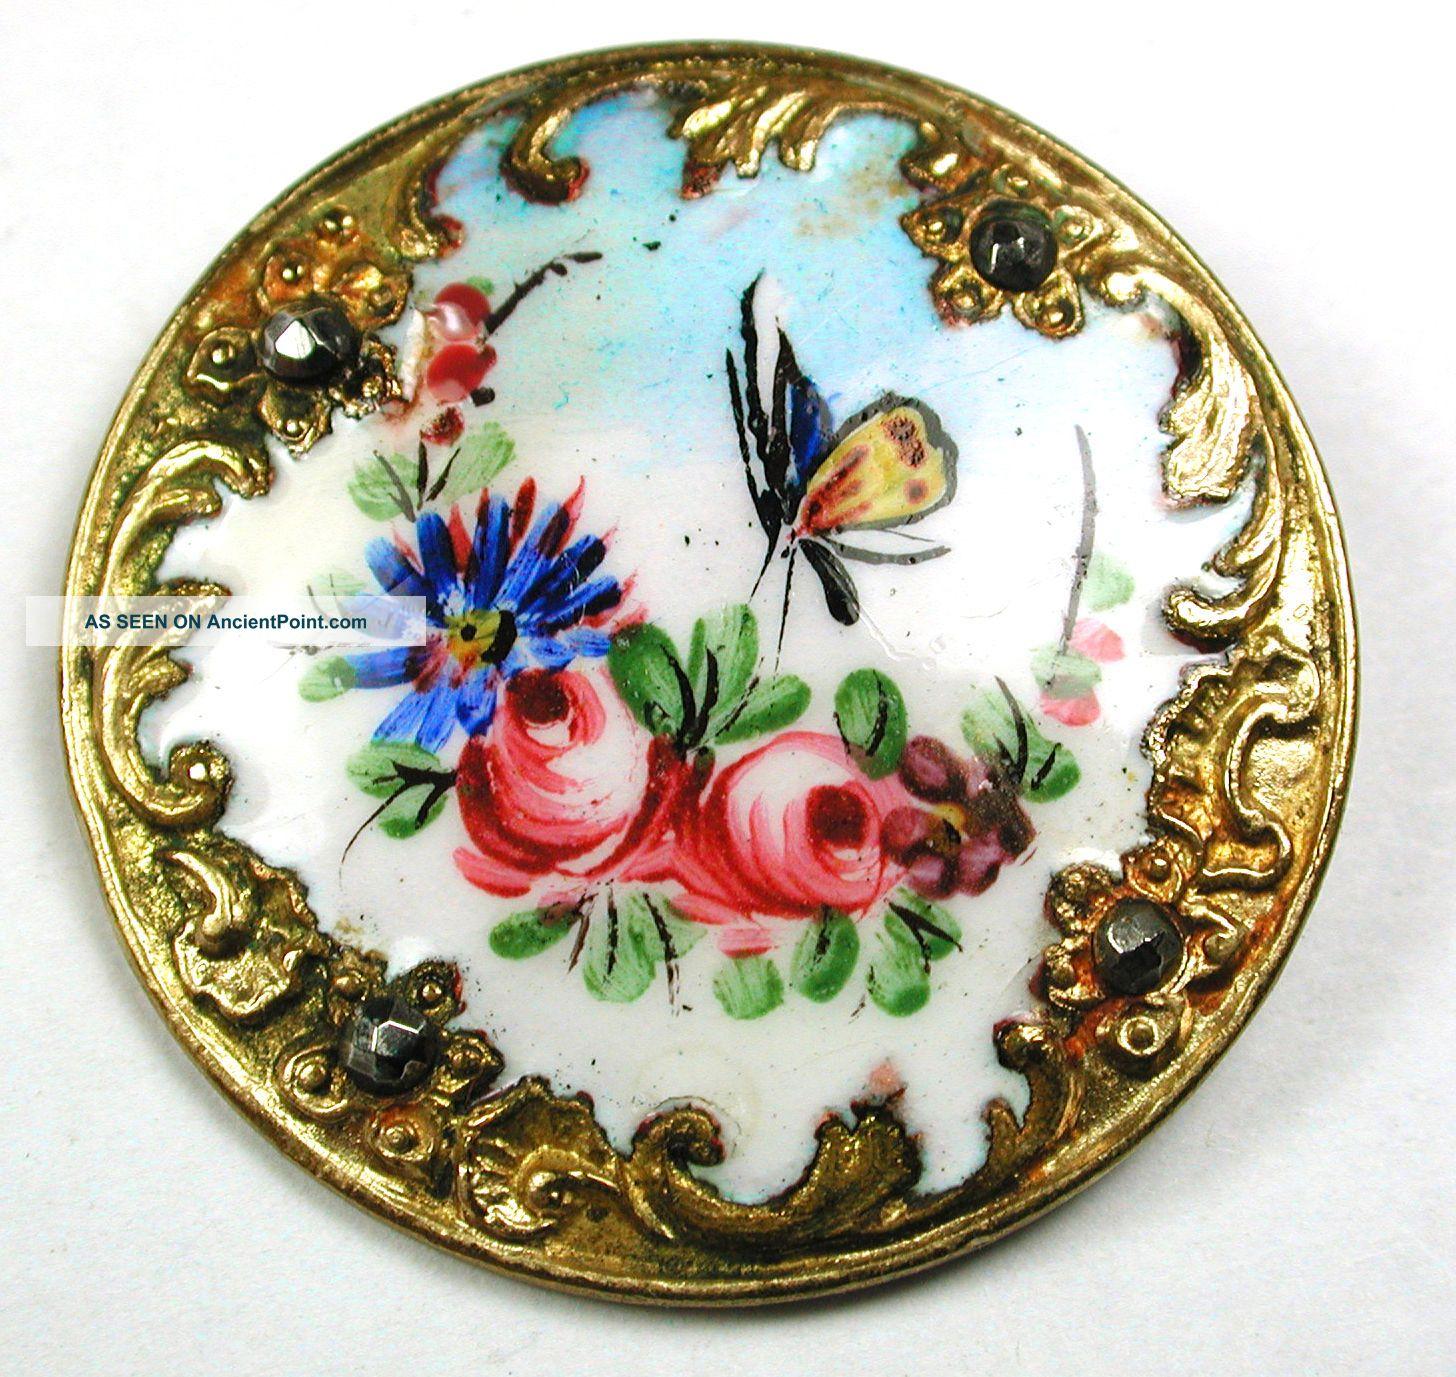 Antique Enamel Button Butterfly & Flowers W/ Fancy Border & Cut Steel Accents Buttons photo